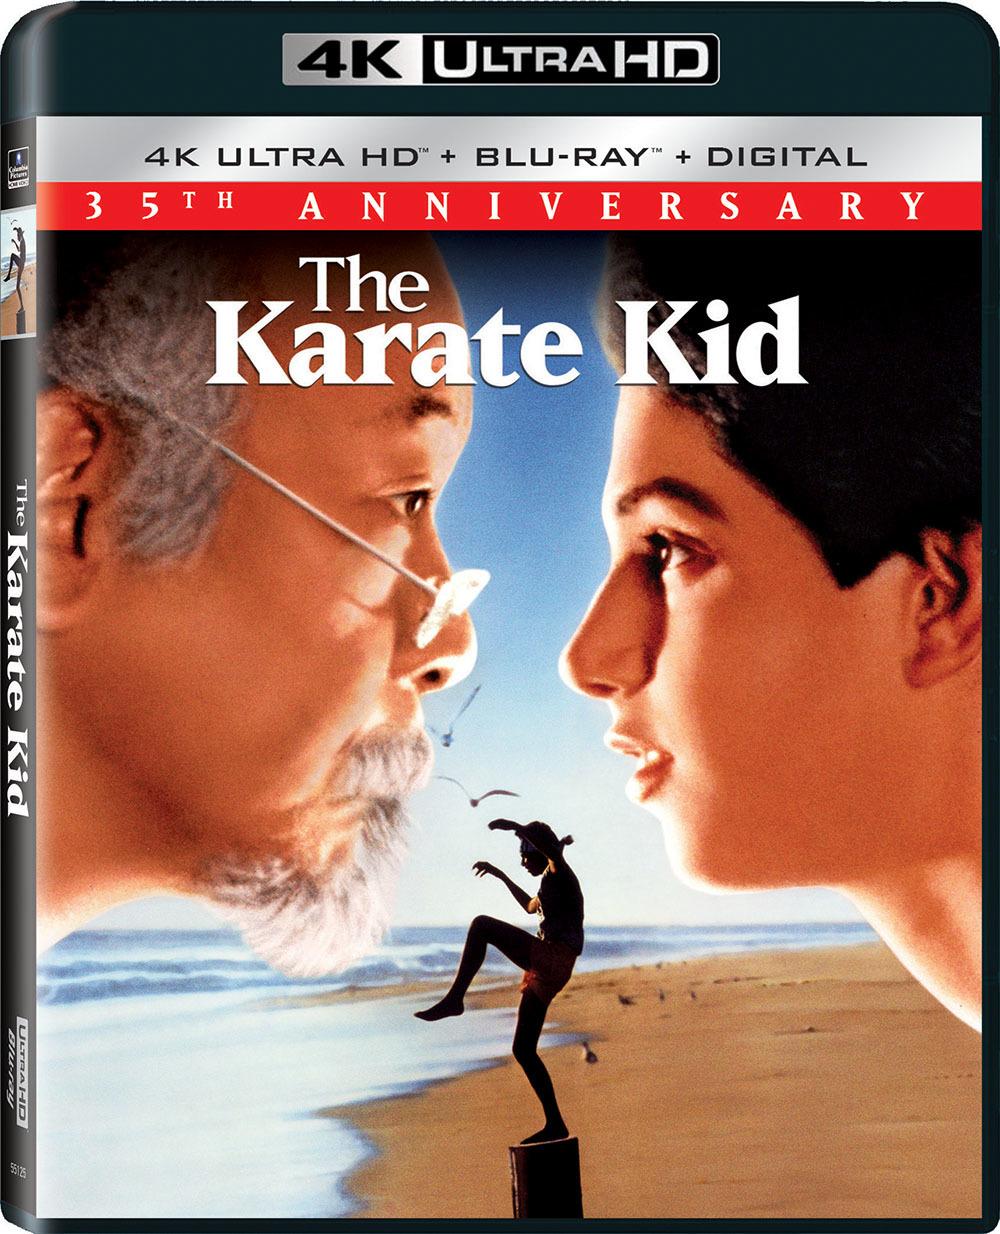 The Karate Kid (4K Ultra HD Blu-ray)(Pre-order / TBA)